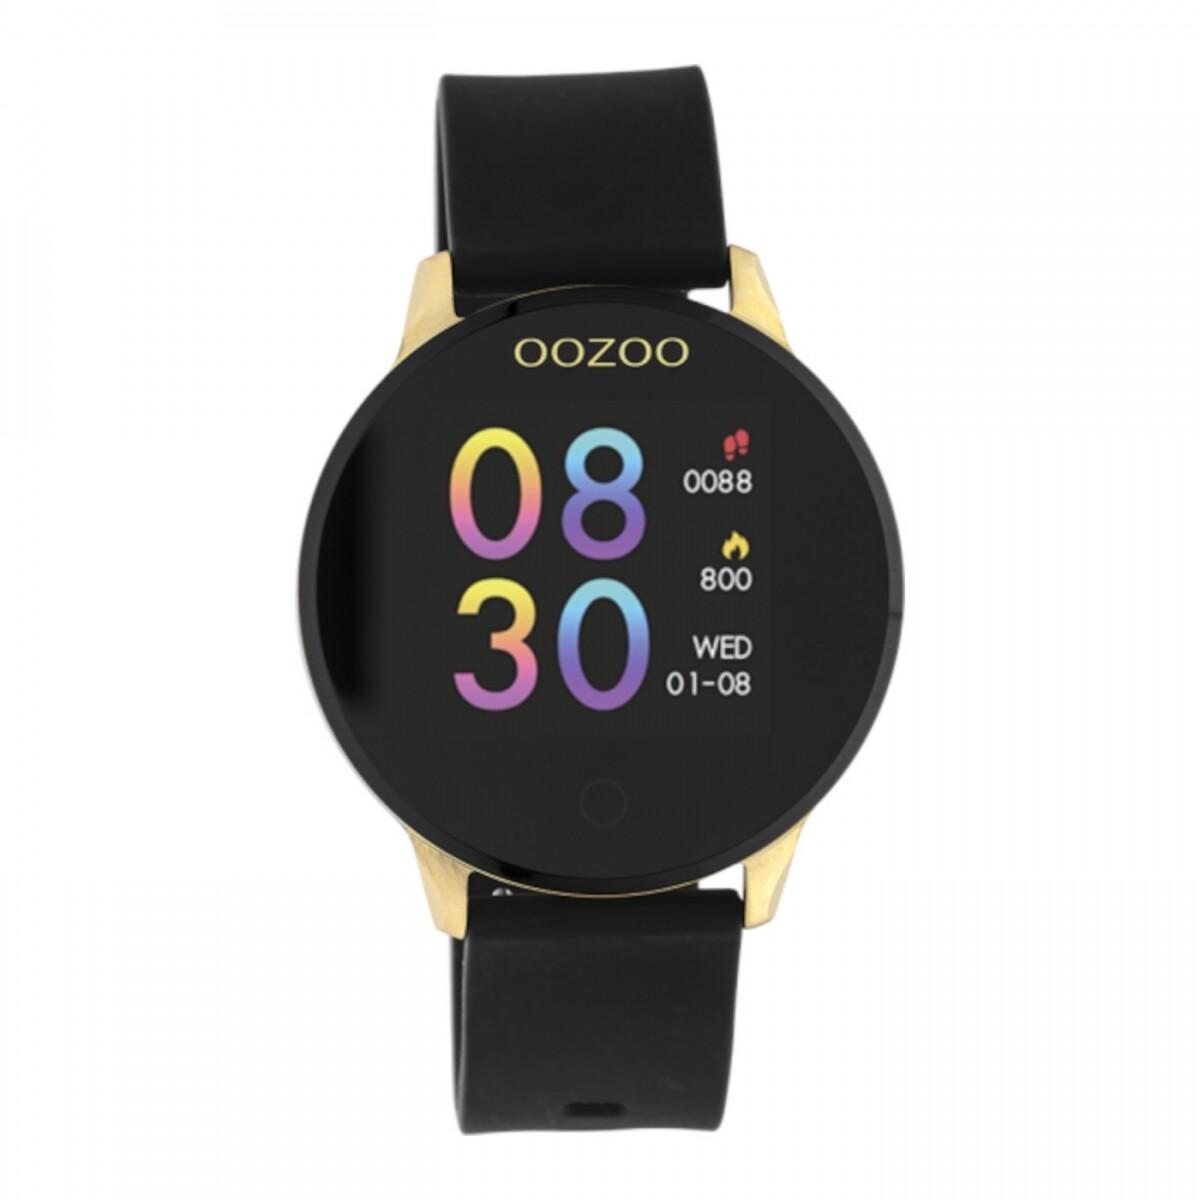 Q00120 smartwatch zwart/goud | OOZOO